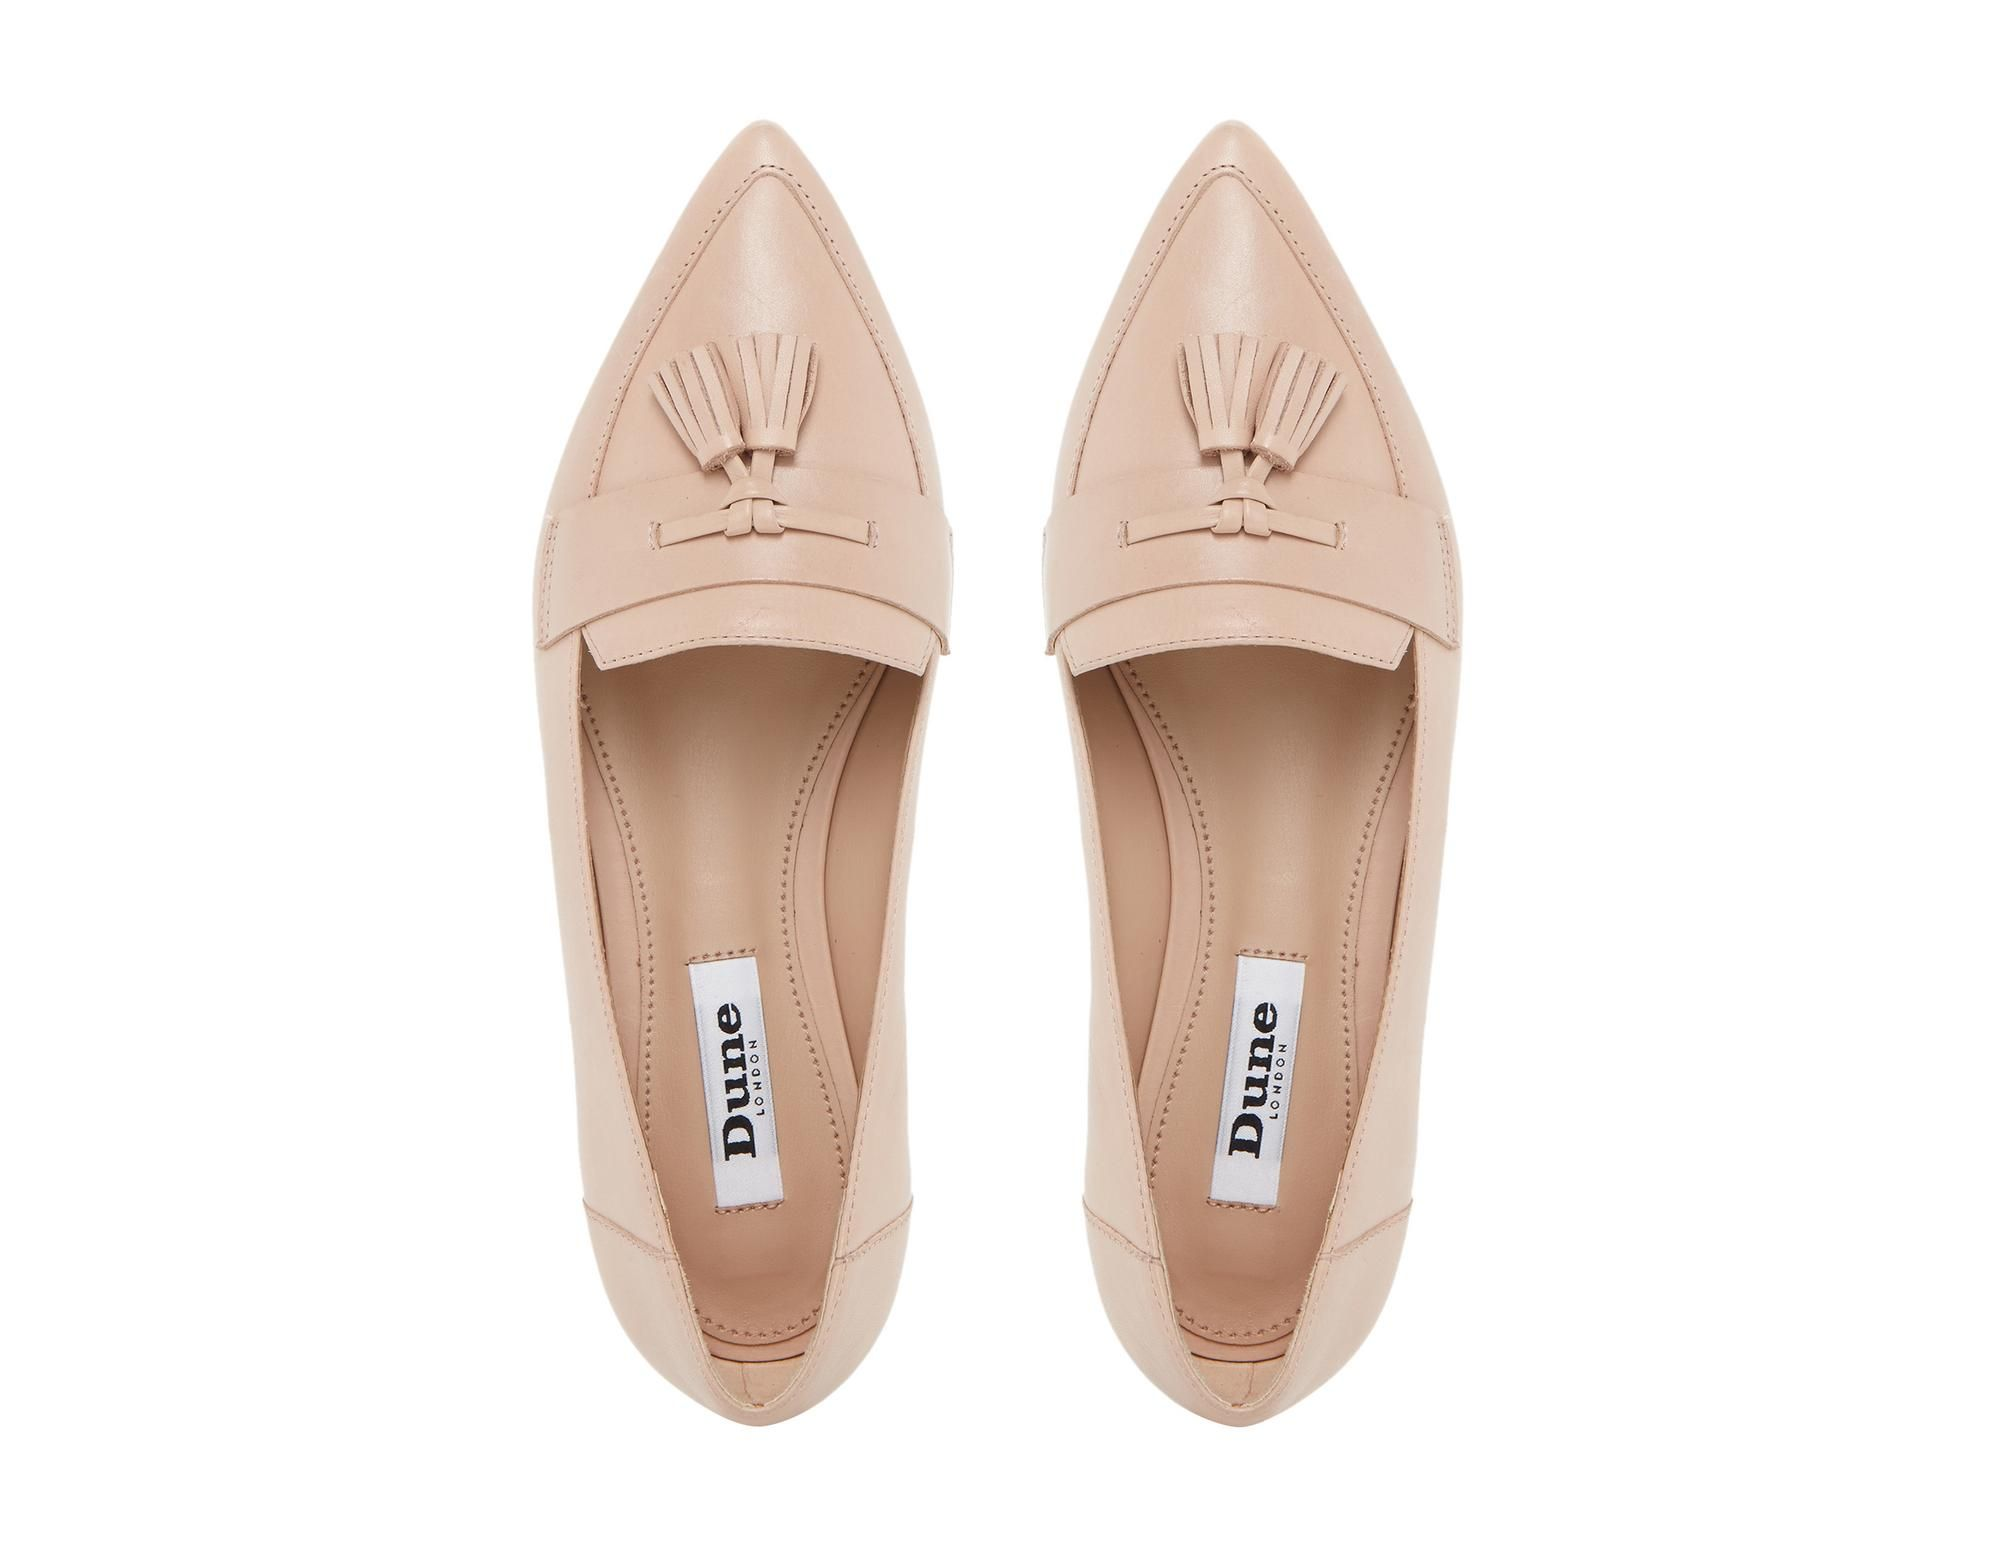 081fa243e83 DUNE LADIES GLINT - Pointed Toe Tassel Loafer - nude